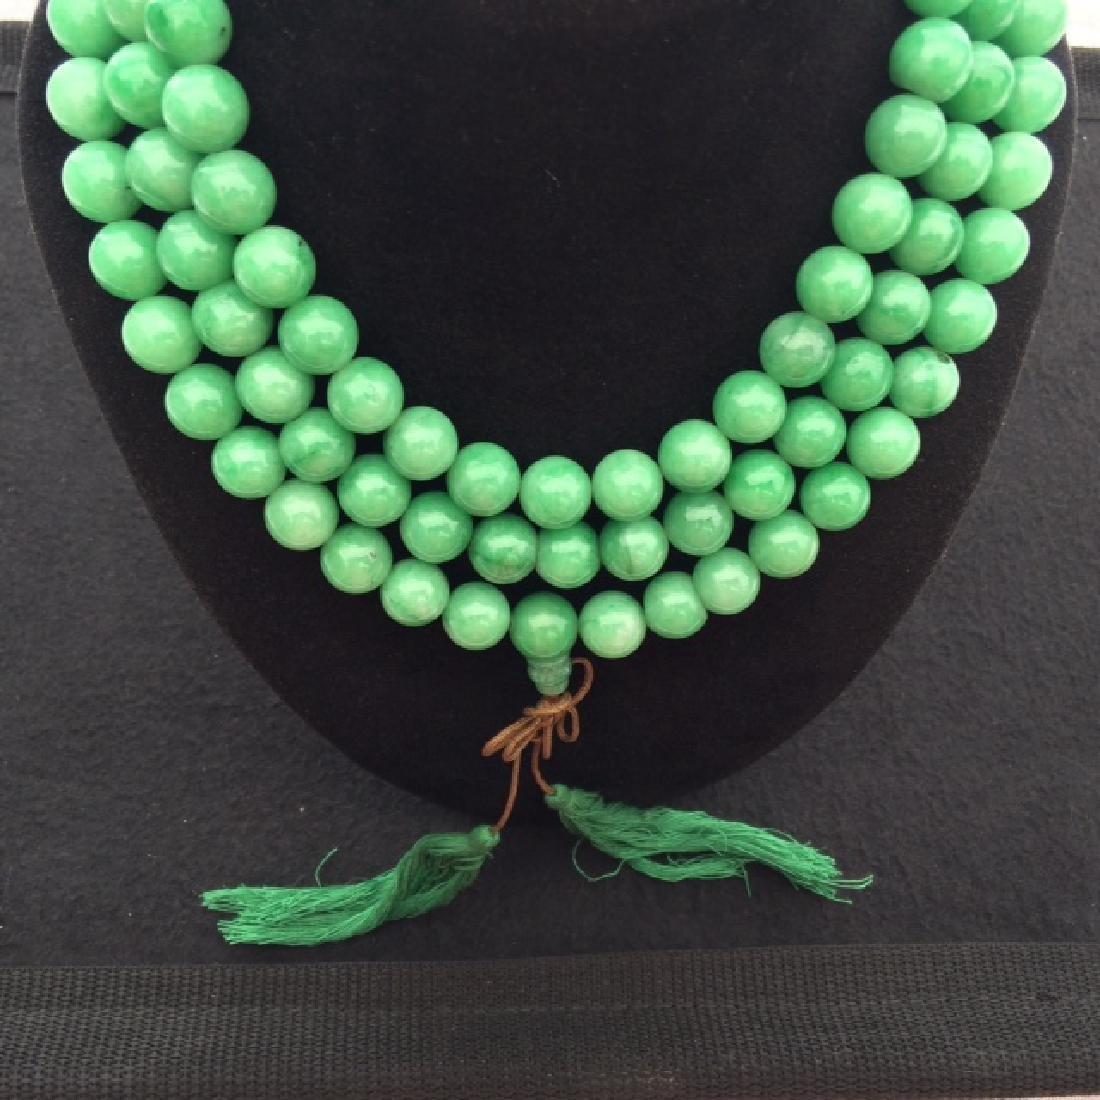 Chinese Green Jadeite Court Bead Necklace